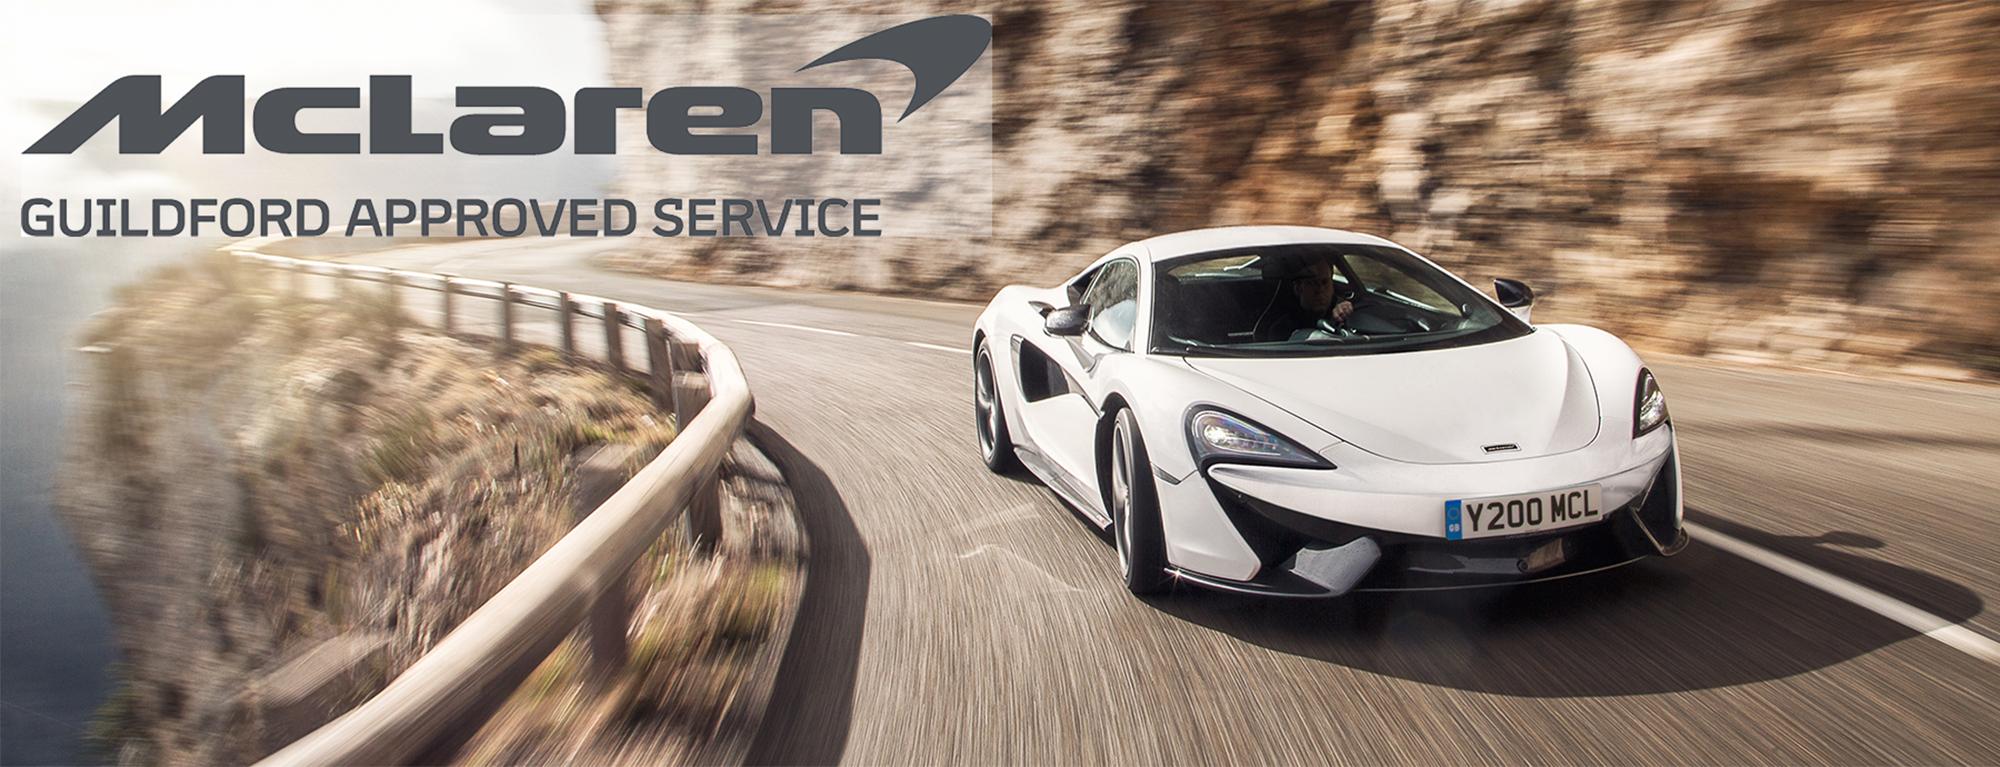 McLaren Approved Guildford